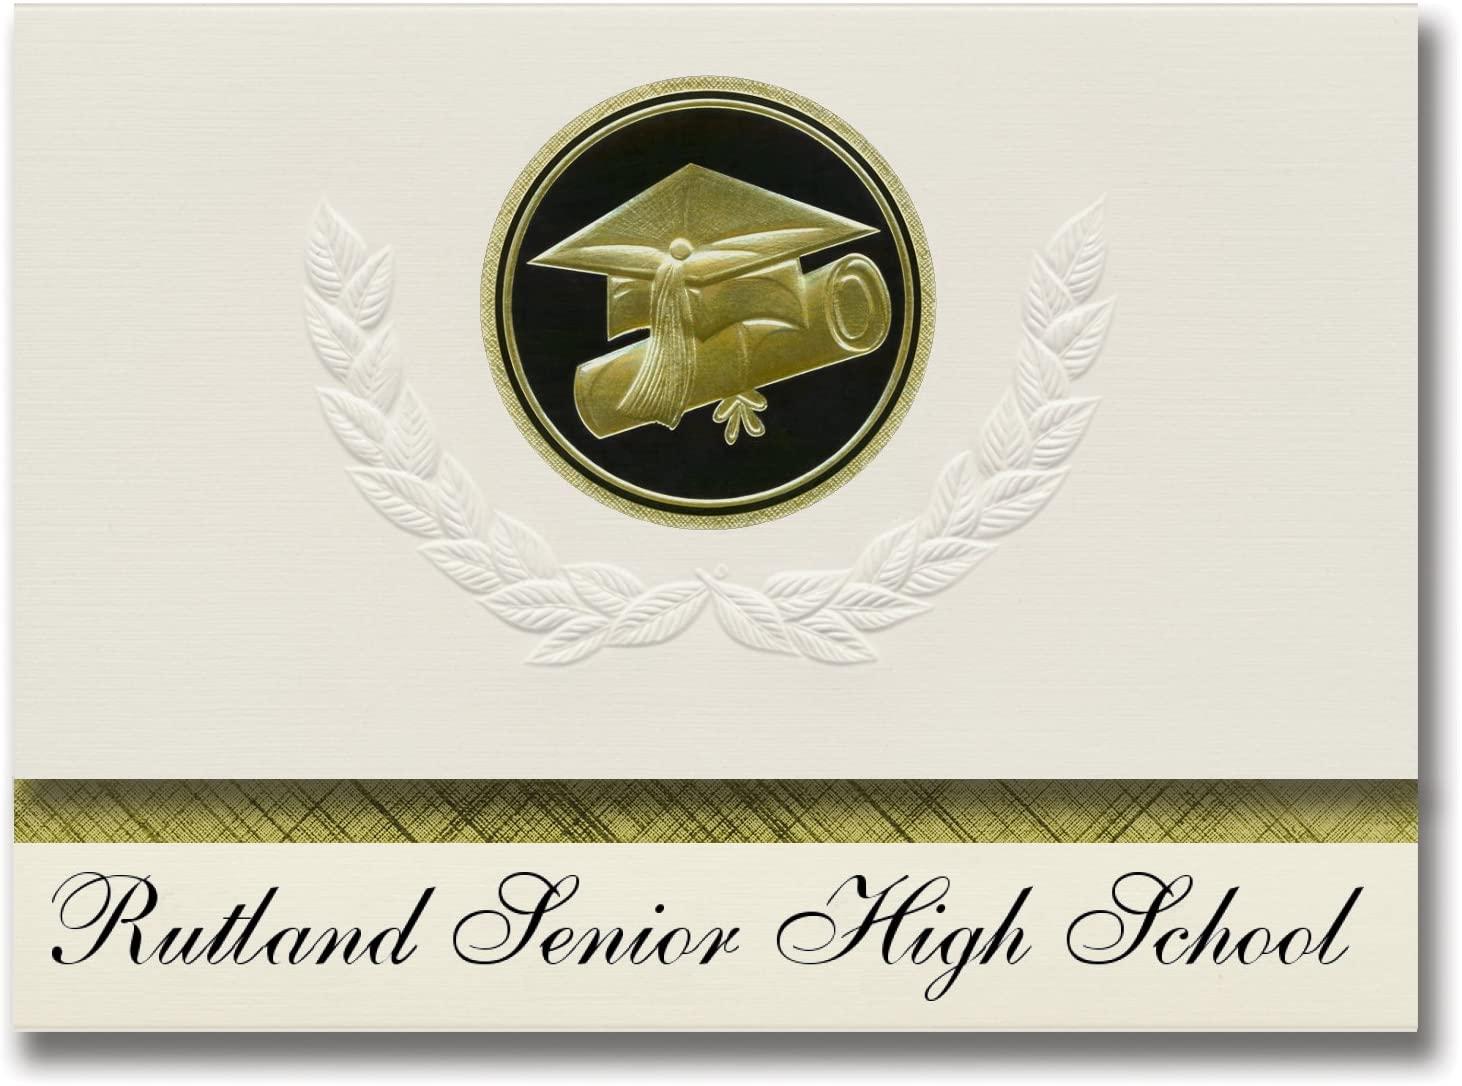 Signature Announcements Rutland Senior High School (Rutland, VT) Graduation Announcements, Presidential style, Elite package of 25 Cap & Diploma Seal Black & Gold